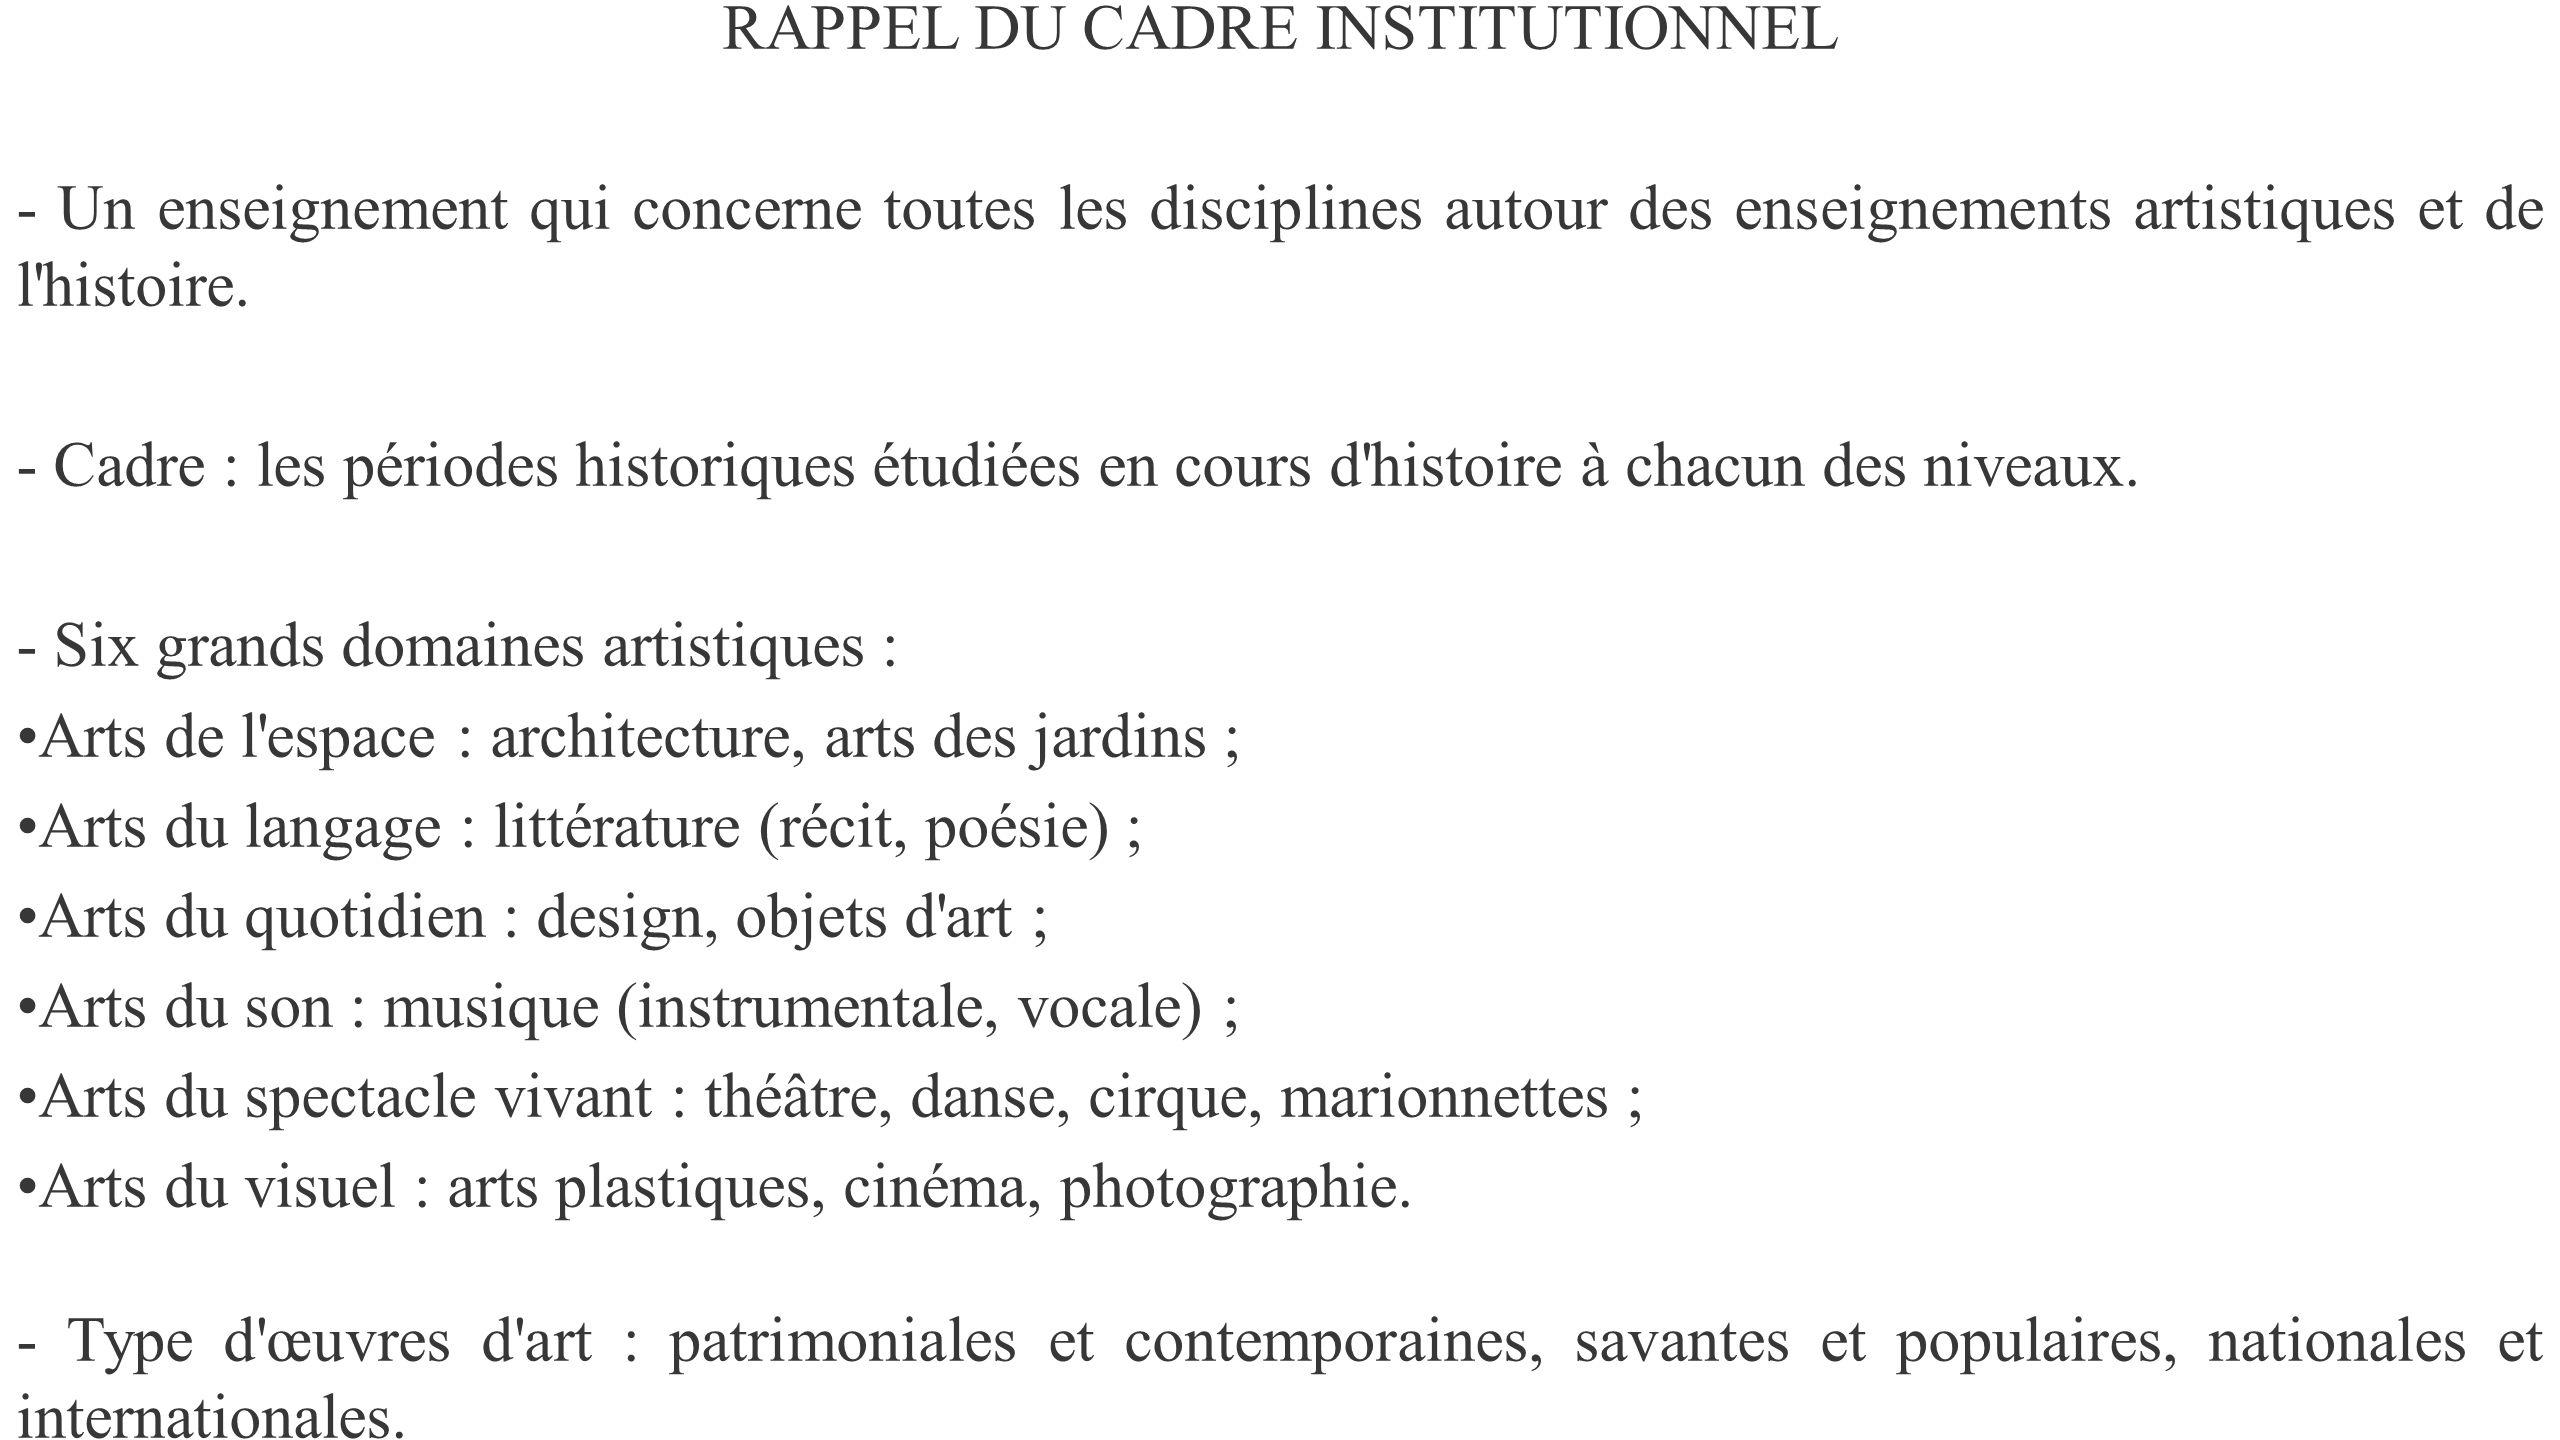 Géométrie et décor architectural arabo-musulman http://www.clg-vallees-garenne.ac-versailles.fr/Apportcivilisation/picts/apport-science2.jpg